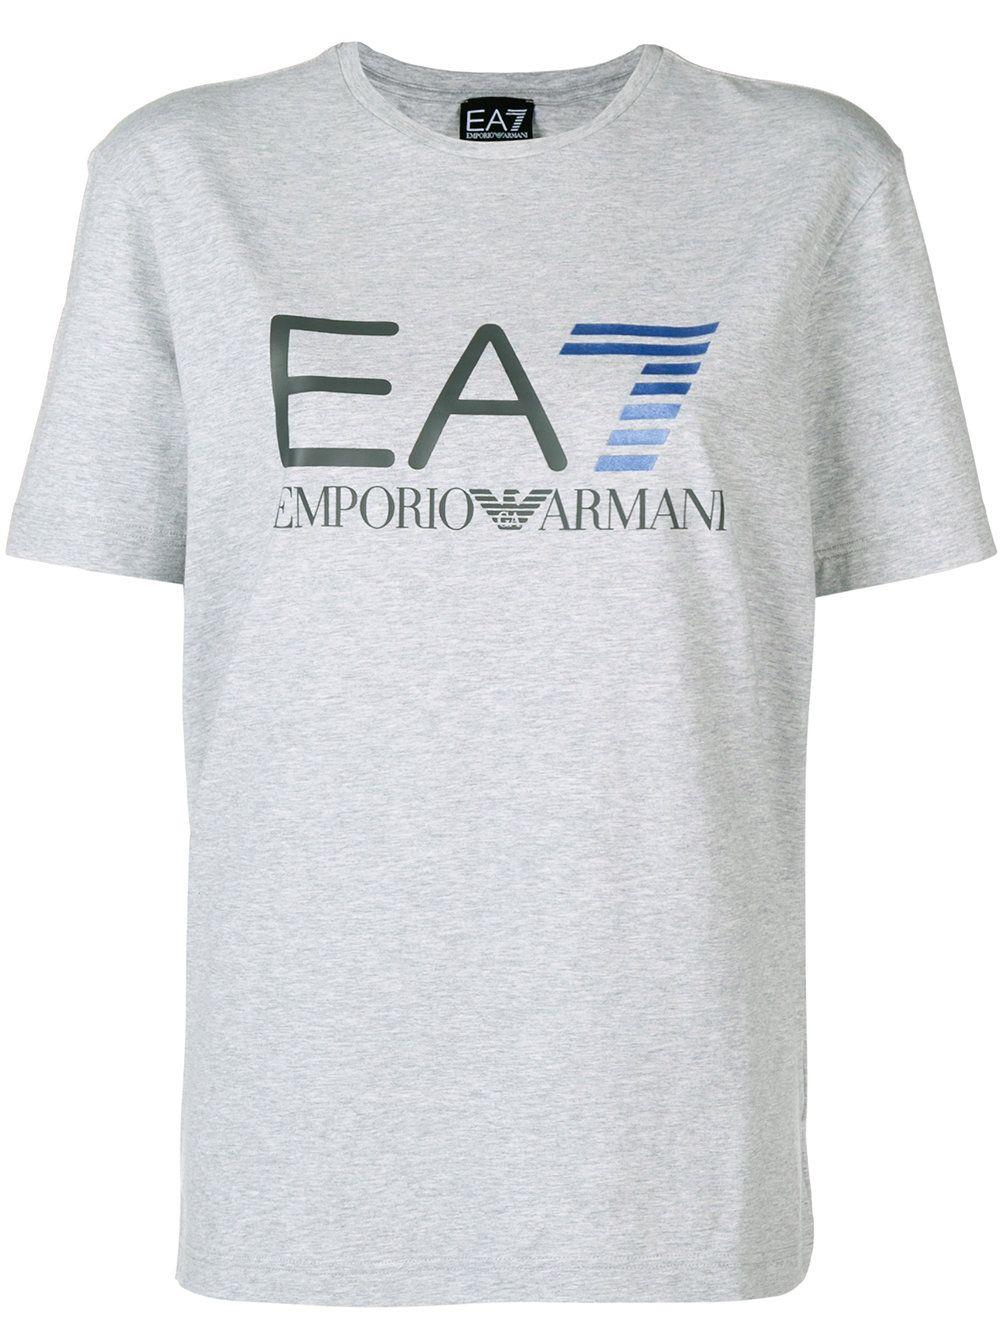 b138c225c Ea7 Emporio Armani Logo print T-shirt | T-shirts | Armani logo, T ...